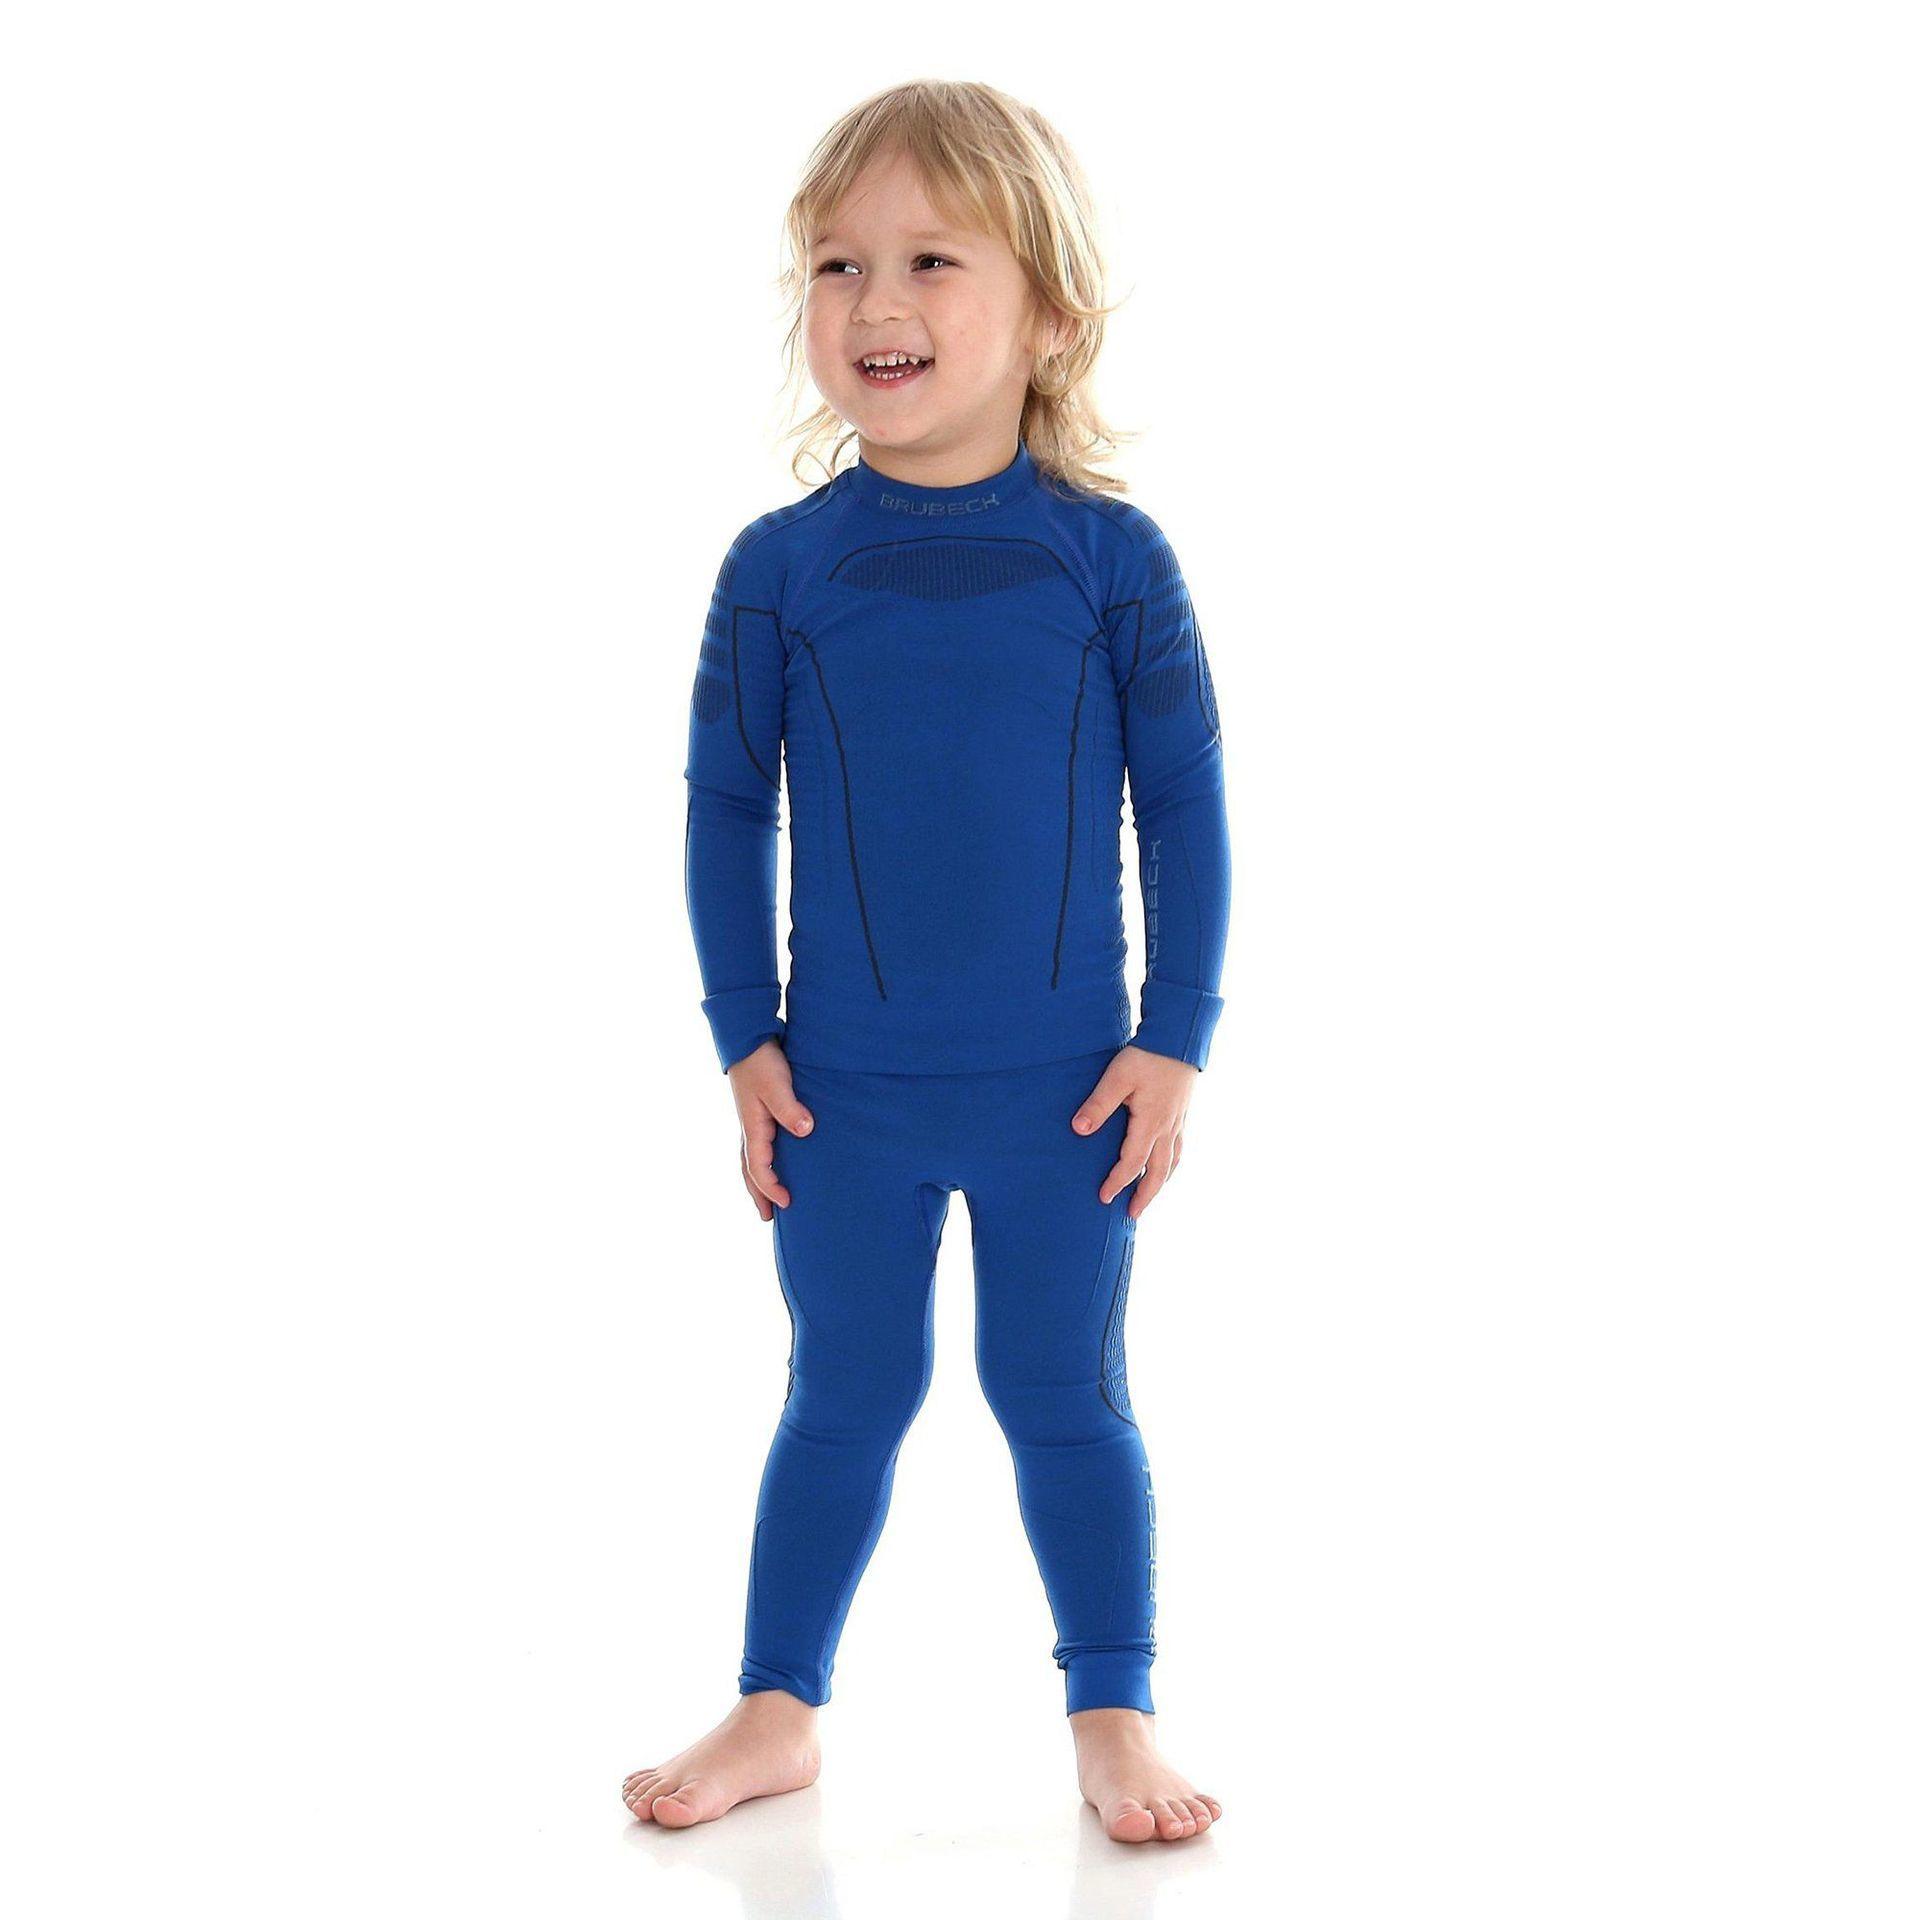 BLUZA BRUBECK THERMO JR LS13660 BLUE